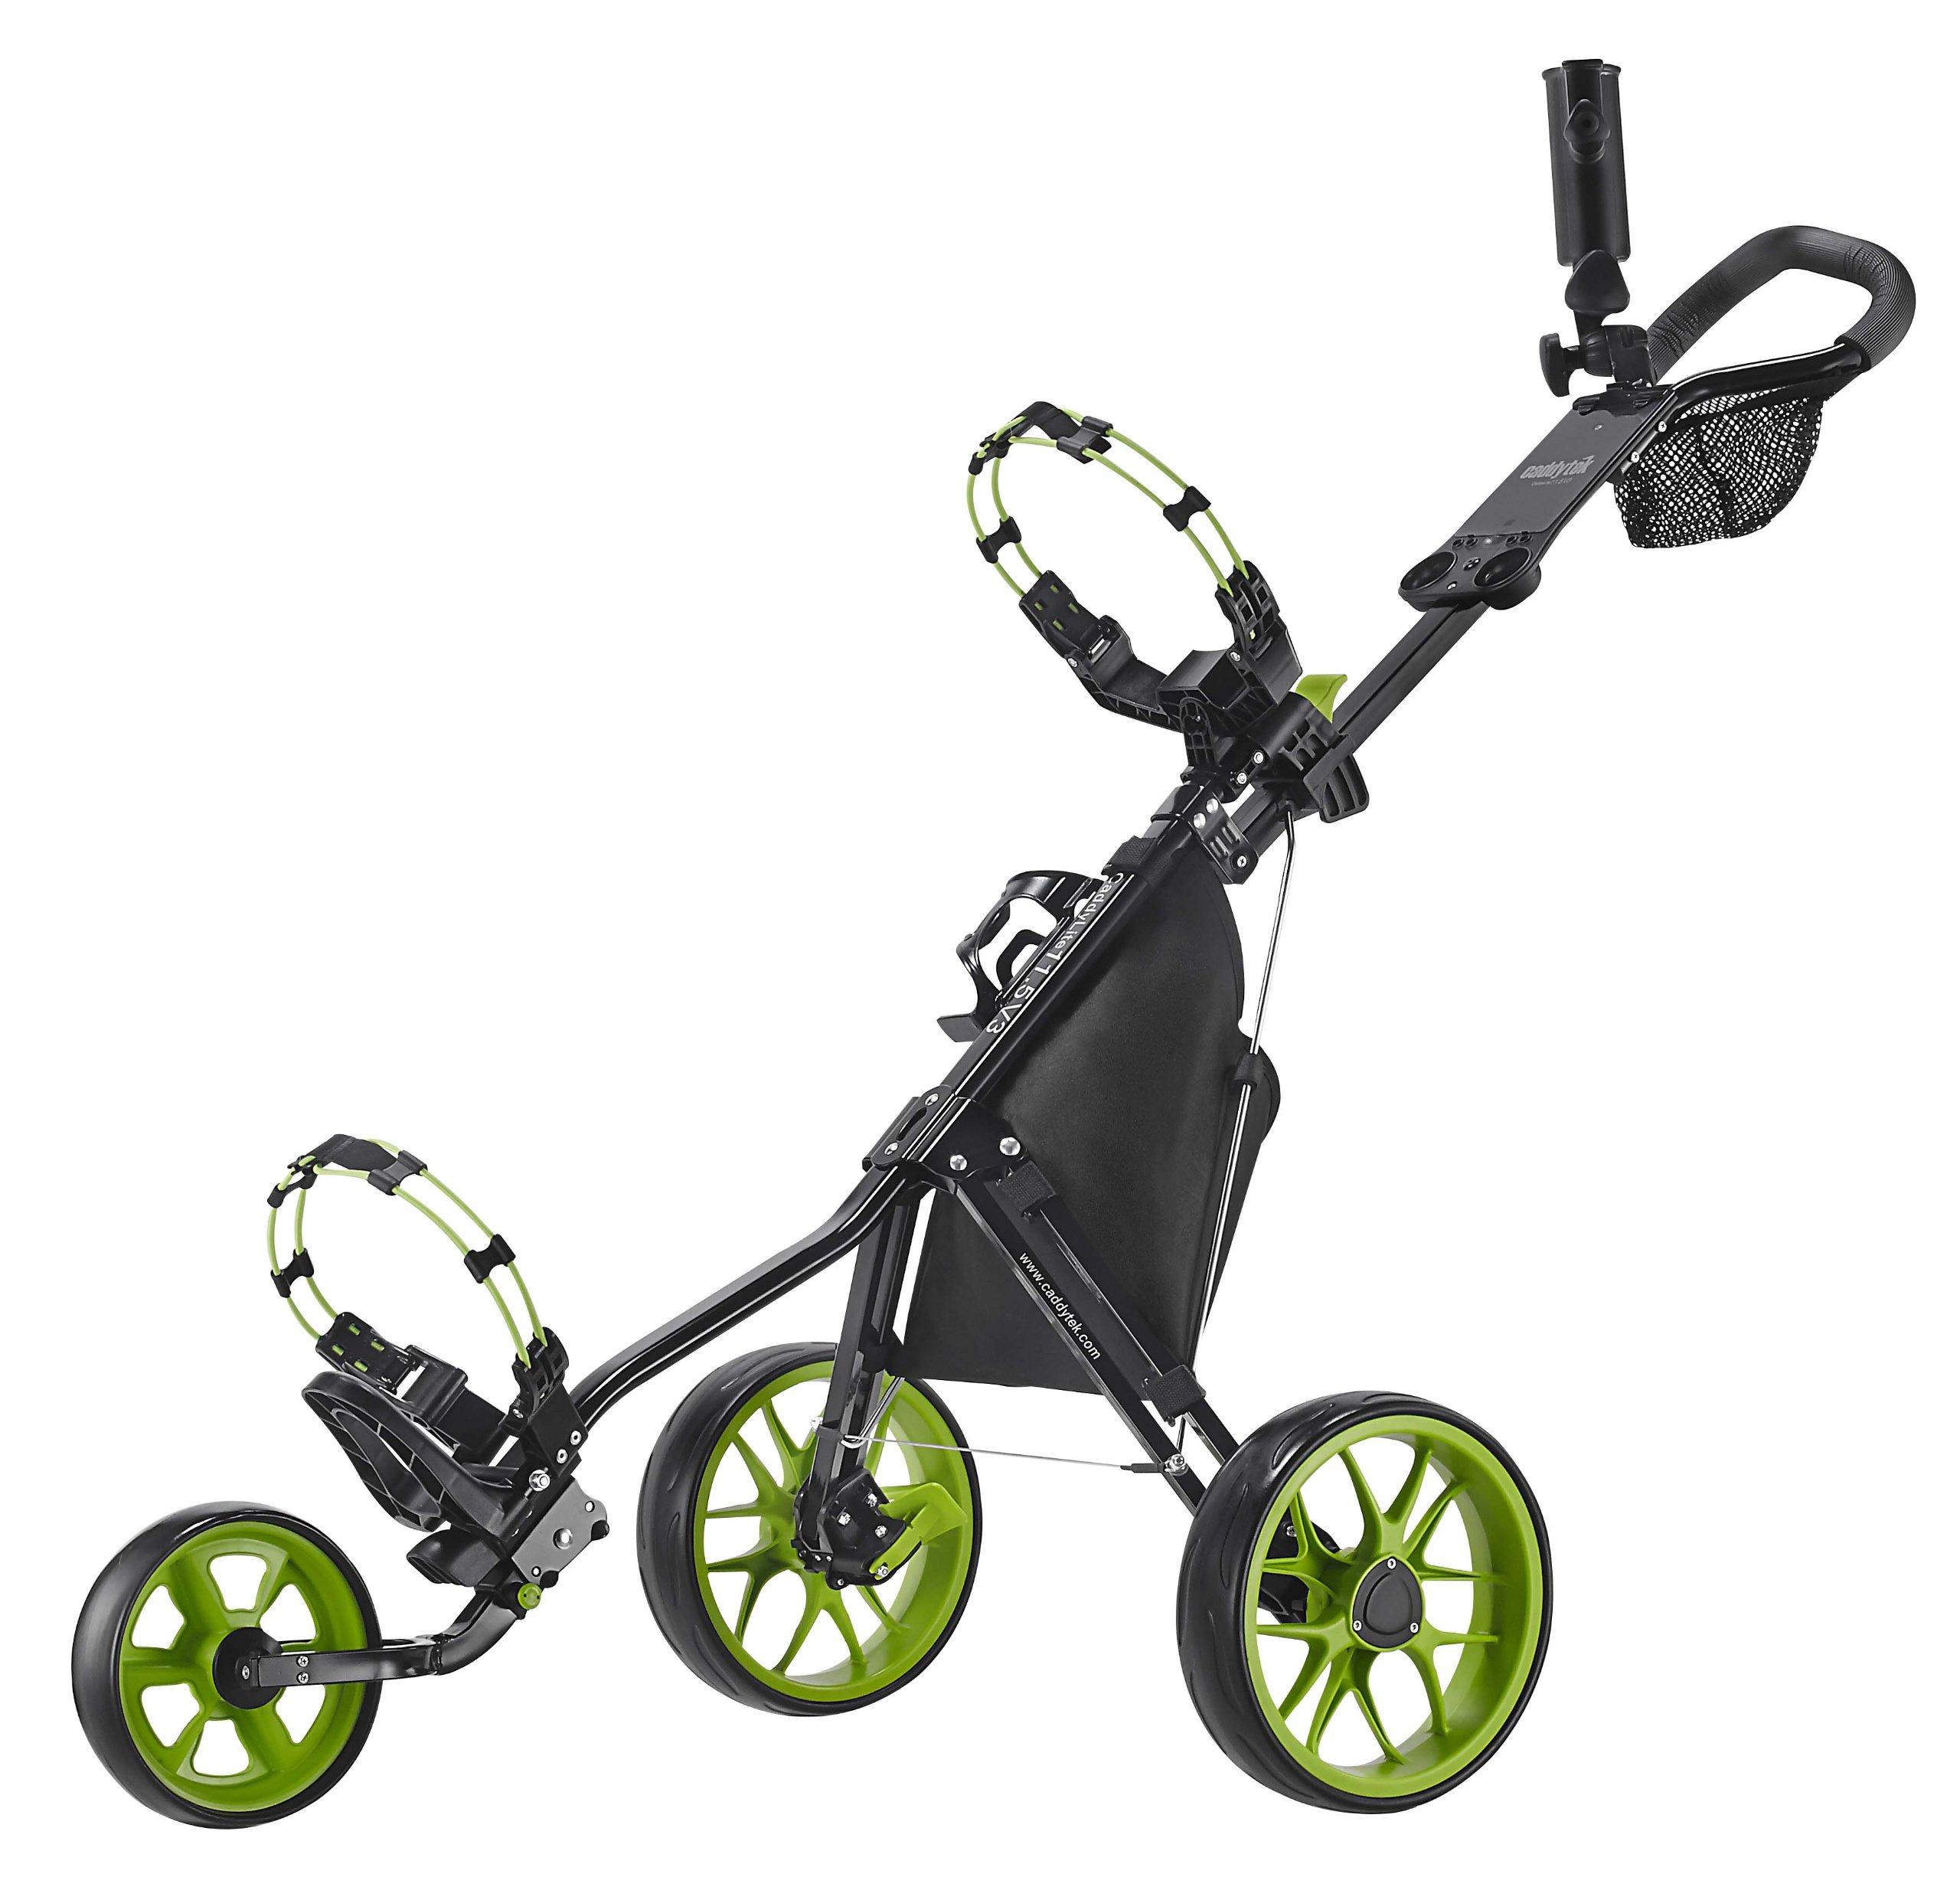 CaddyTek Deluxe 3 Wheel Golf Push Cart Version 3, CaddyLite 11.5 V3- Green by CaddyTek